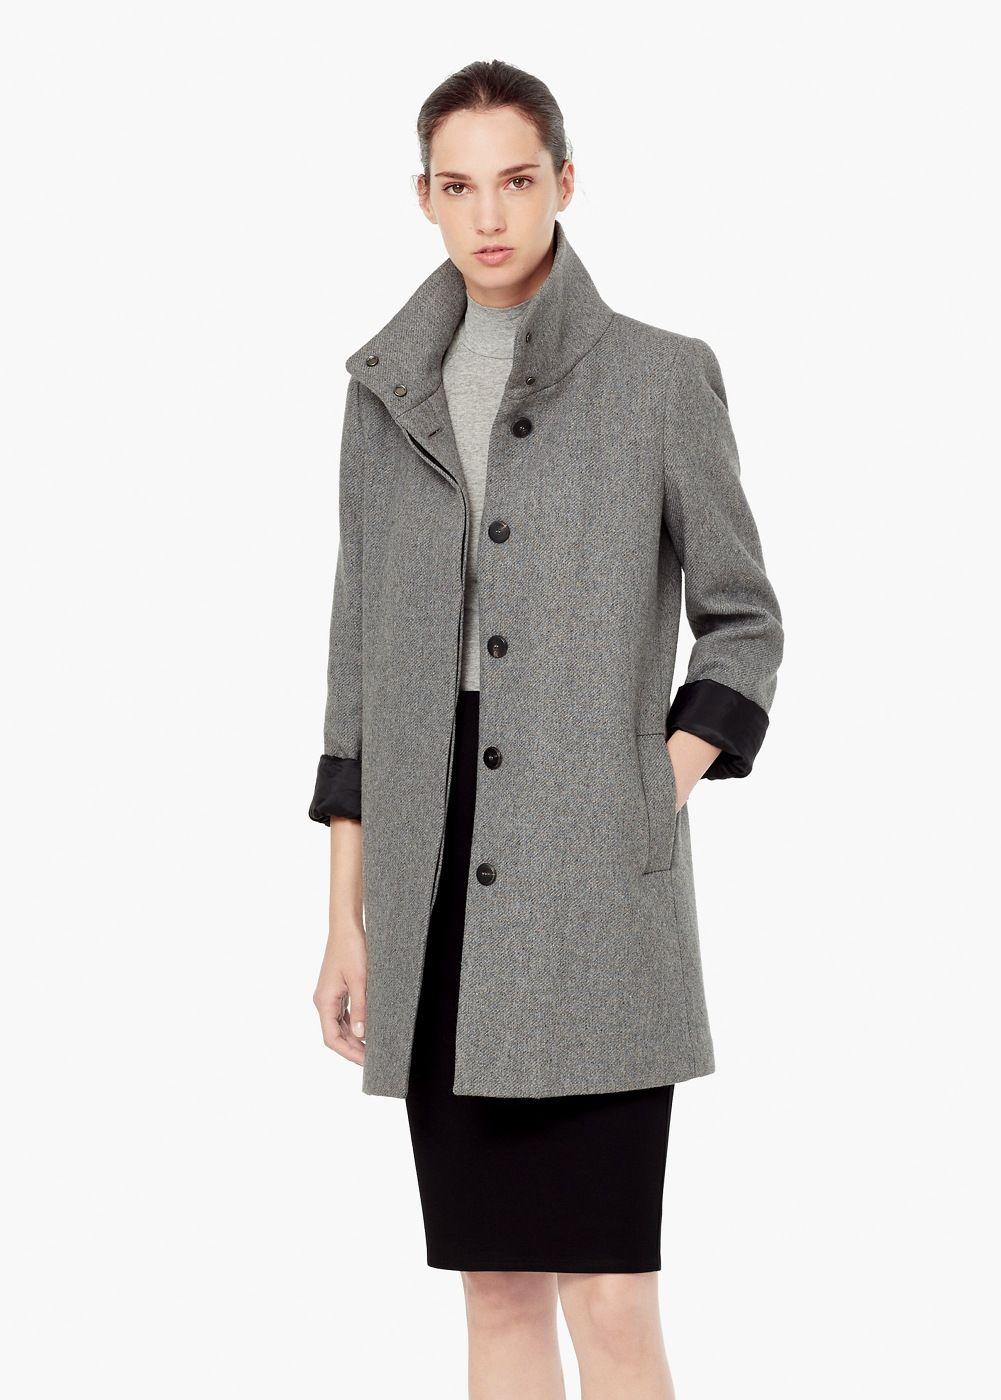 Abrigo cuello chimenea - Abrigos de Mujer  40fdacab05db